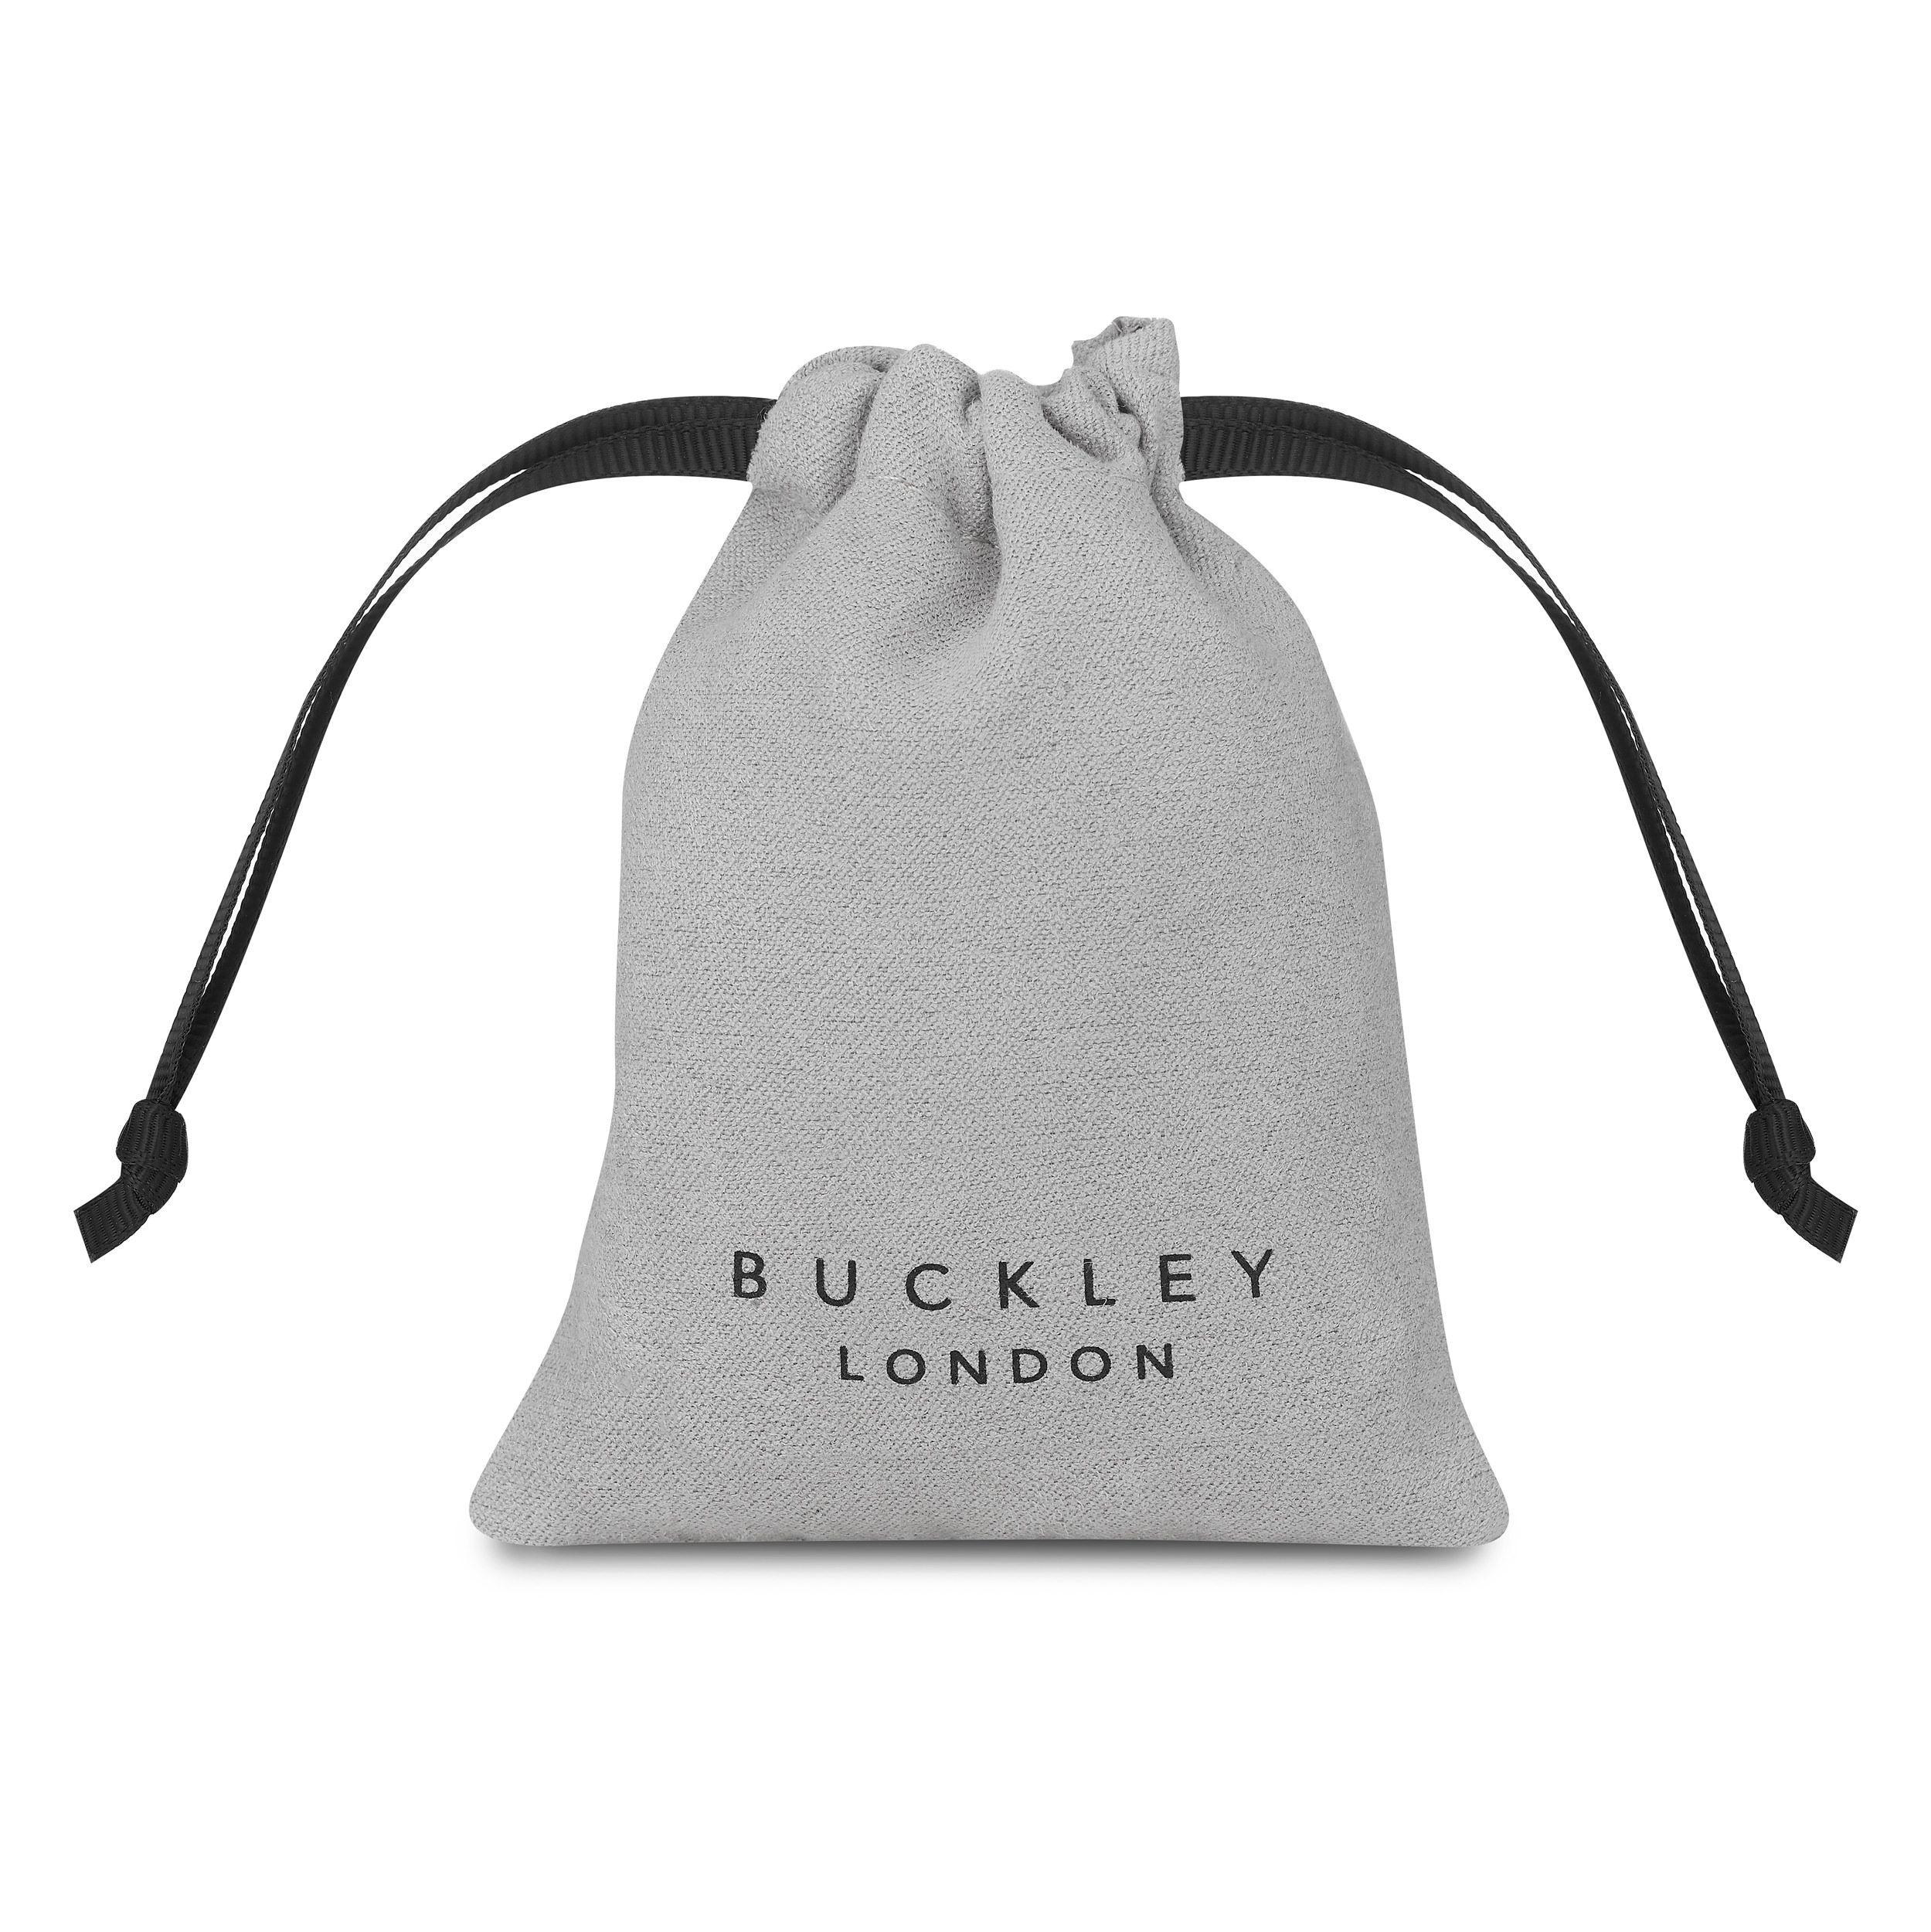 Buckley London Bamboo Bracelet - Gold Bag